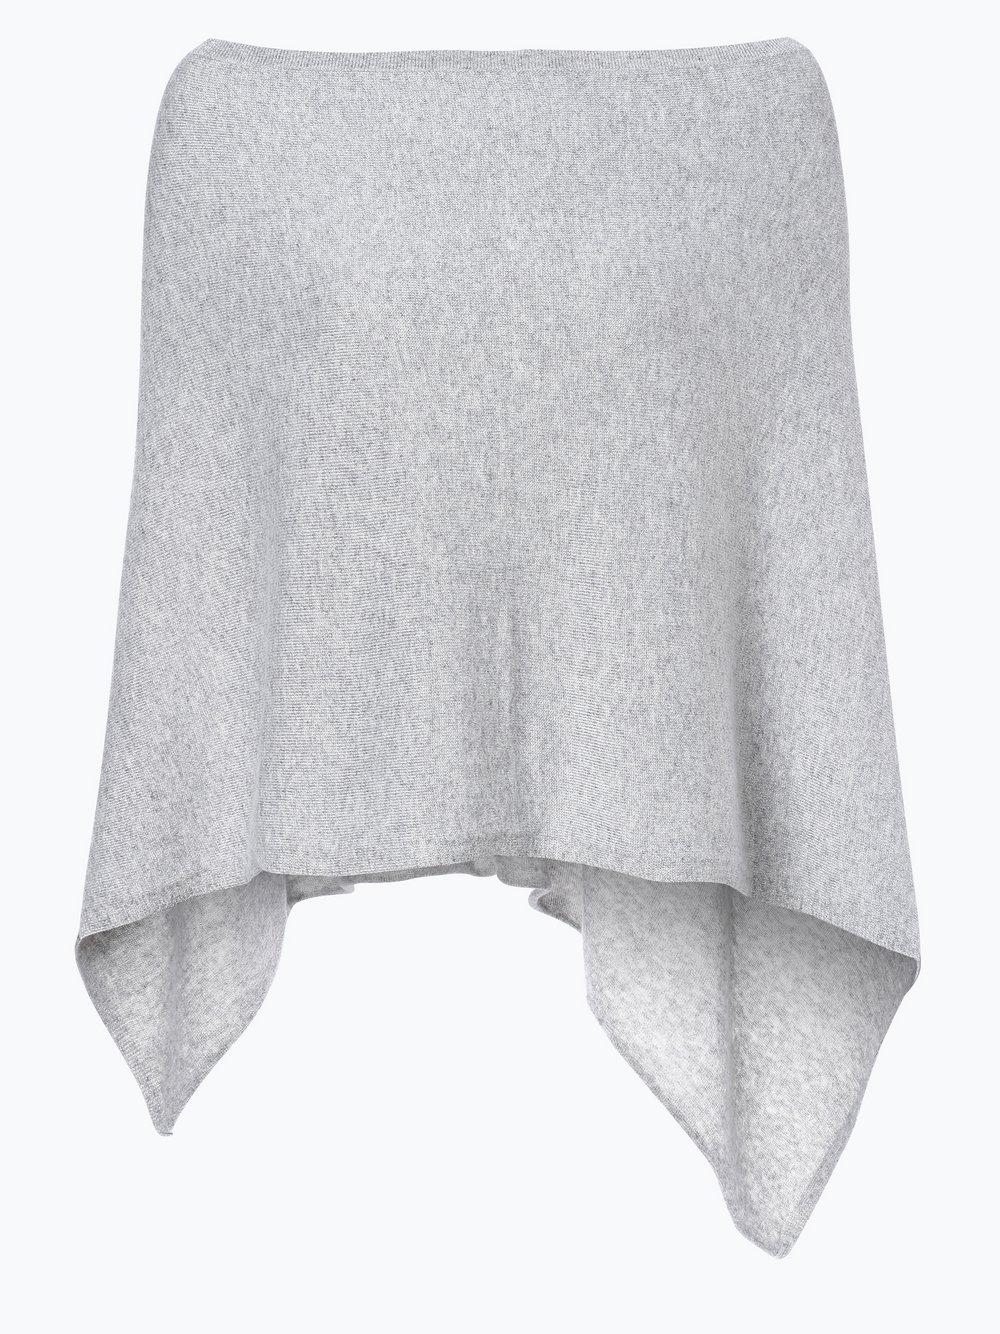 18b13e9997f76b s.Oliver Black Label Damen Poncho online kaufen | VANGRAAF.COM